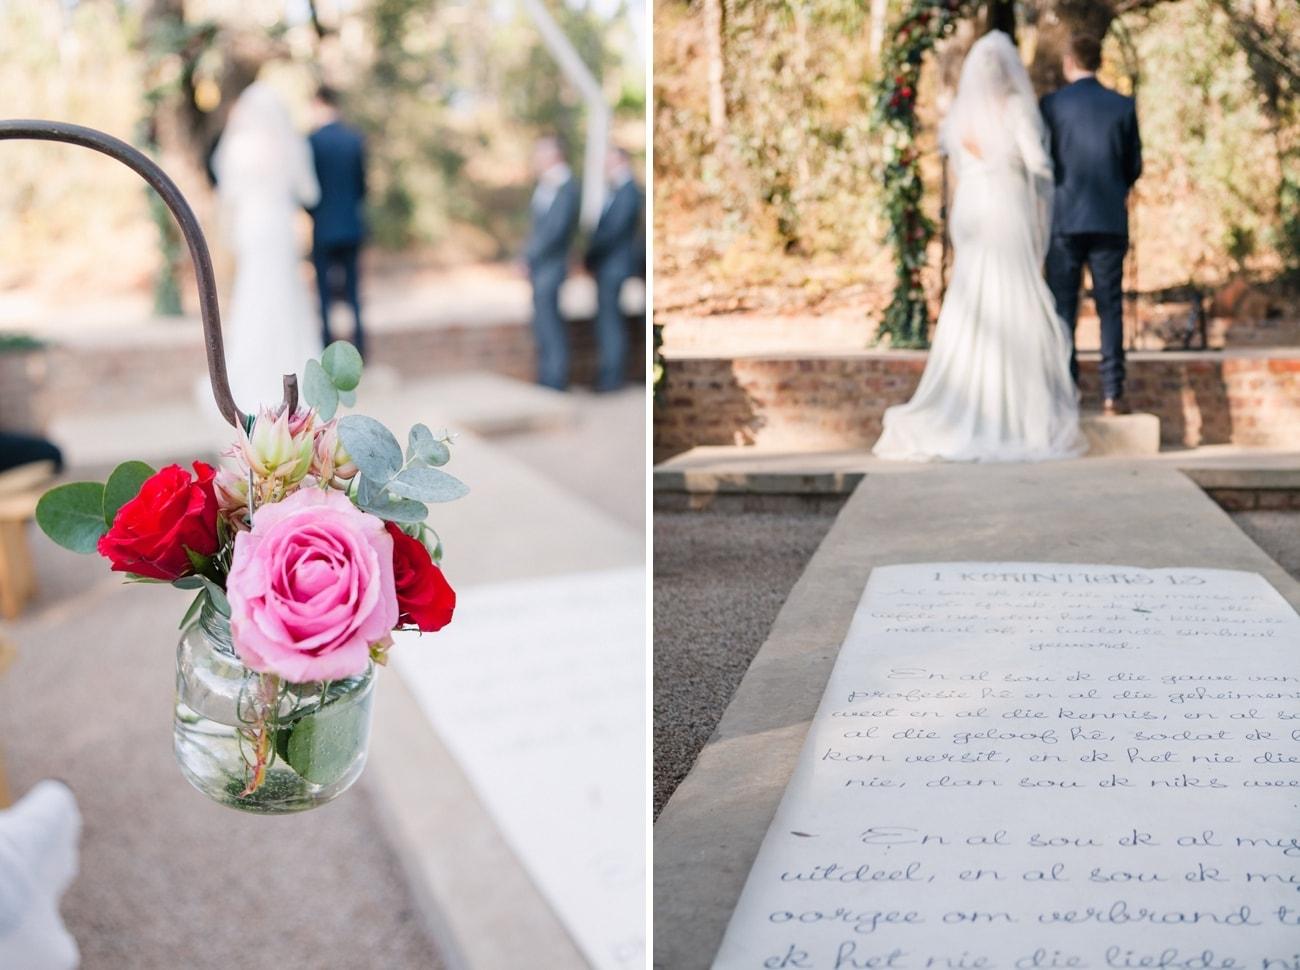 Ceremony Decor | Joyous Jewel Tone Winter Wedding | Credit: Dust and Dreams Photography